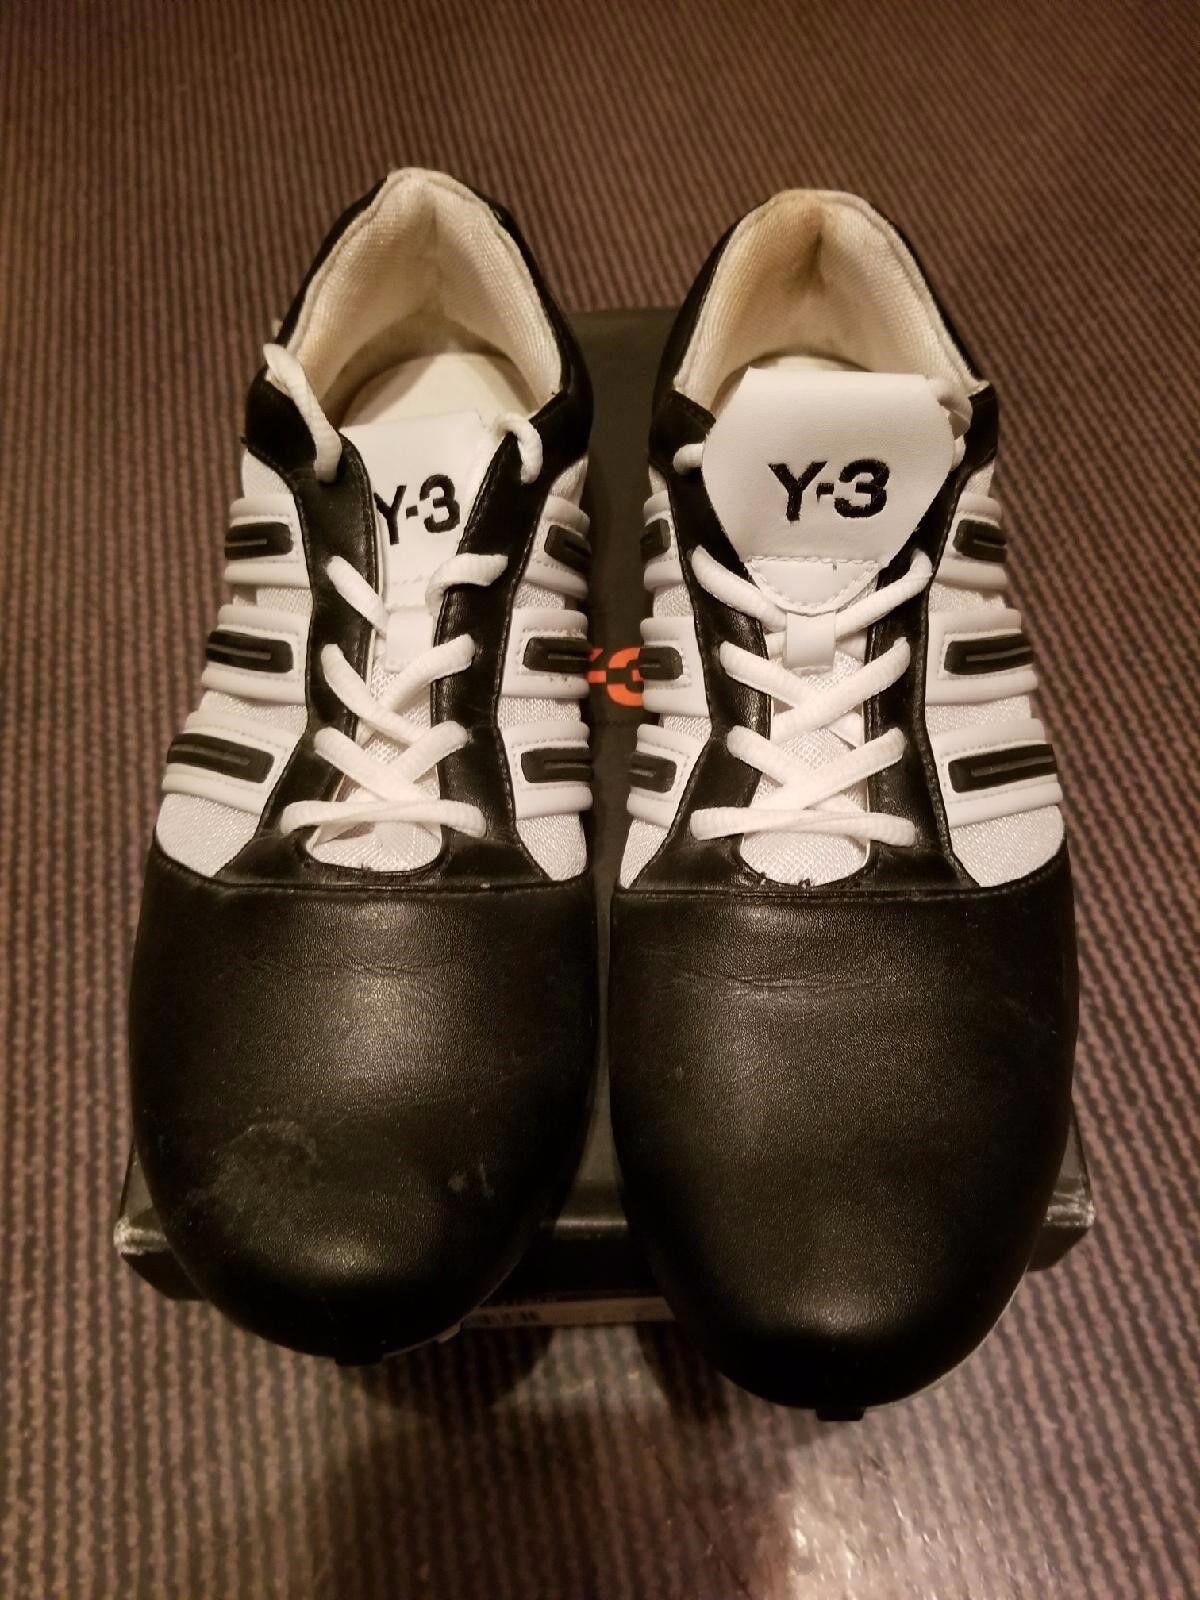 adidas y 3 atletica black sz noi yoshi yamamoto 81aabc